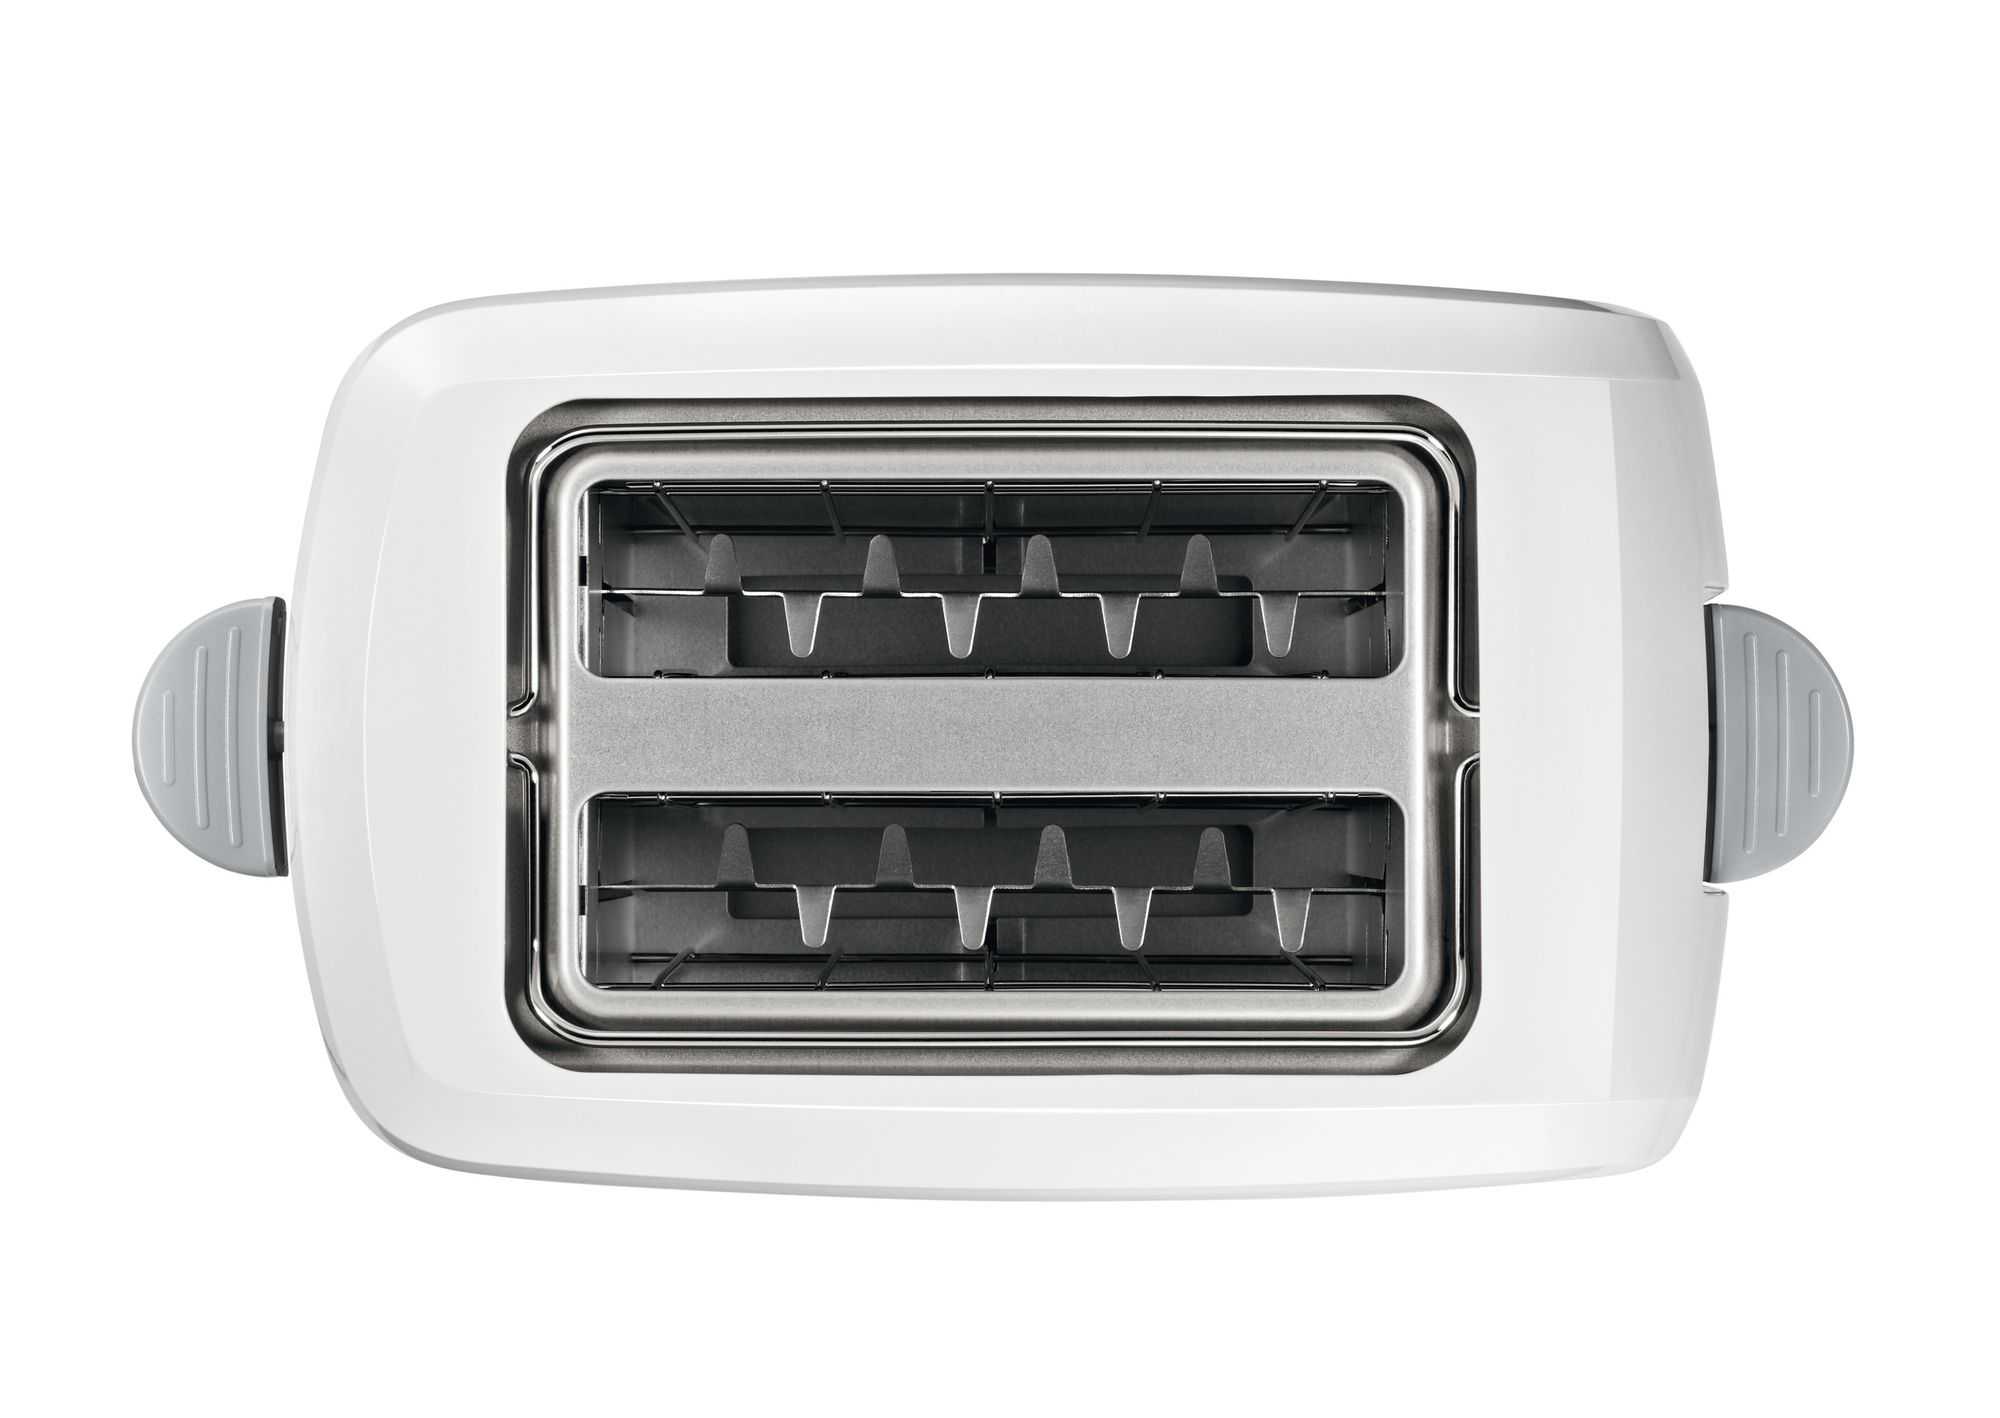 Toster electronic CompactClass bela / svetlo siva